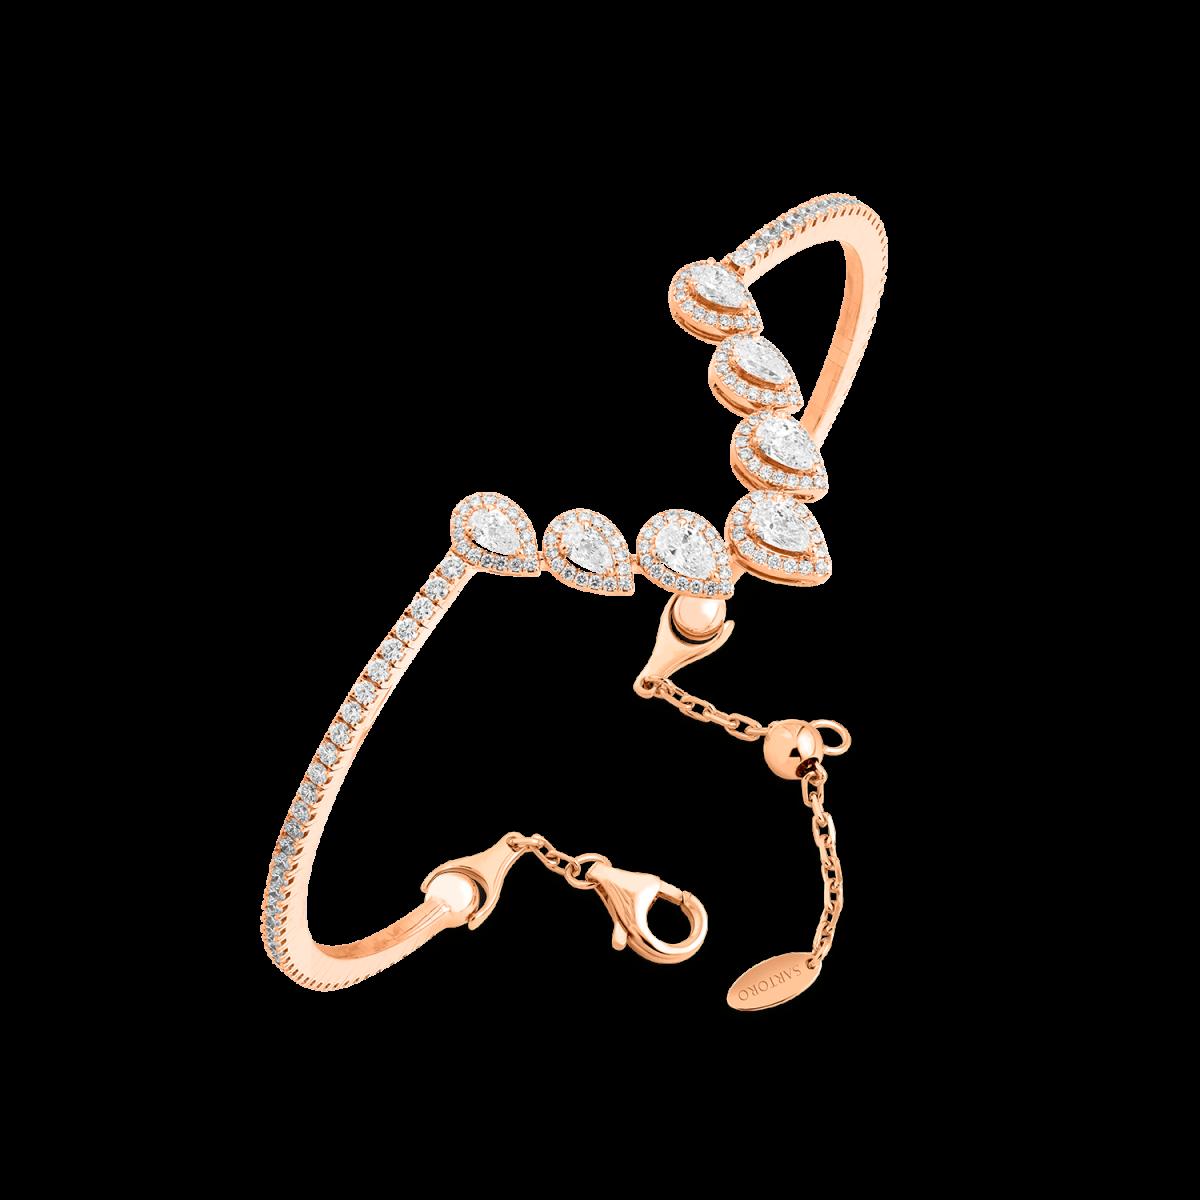 Ariana rose gold bangle with diamonds